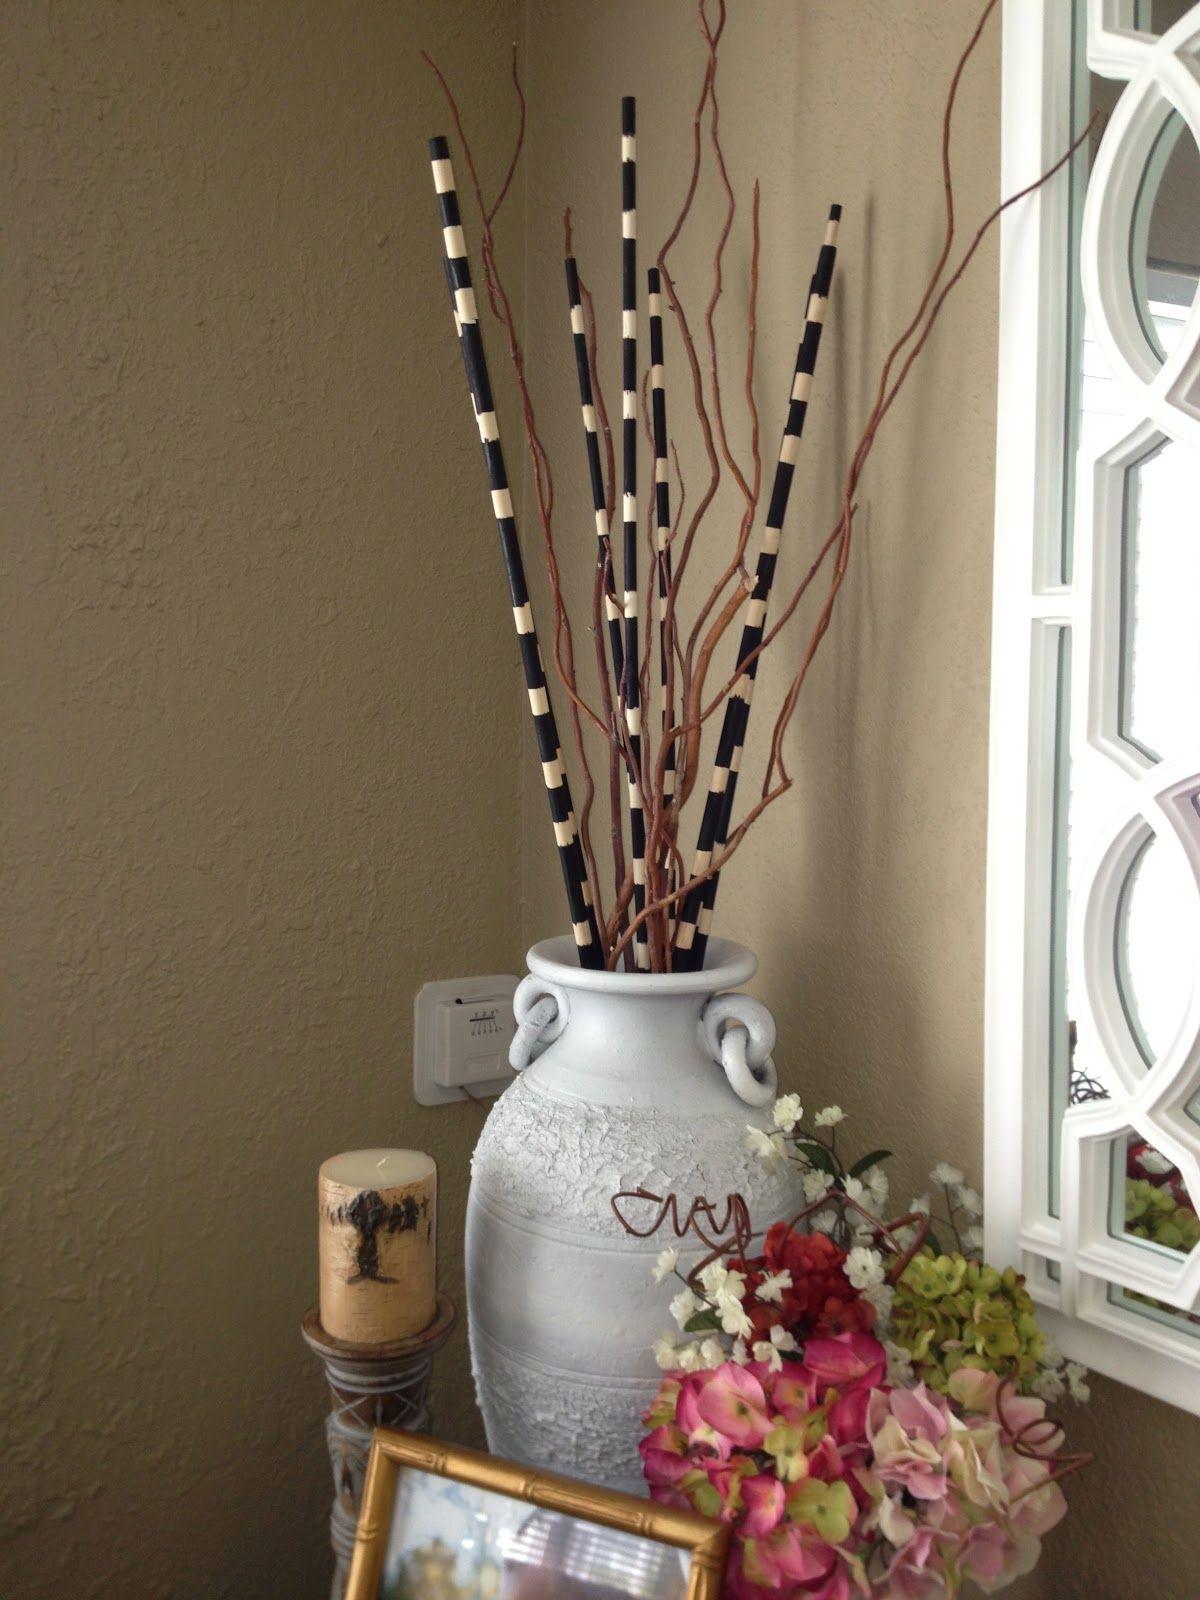 Black And White Decorative Sticks Lets Get Those Turkish Vases